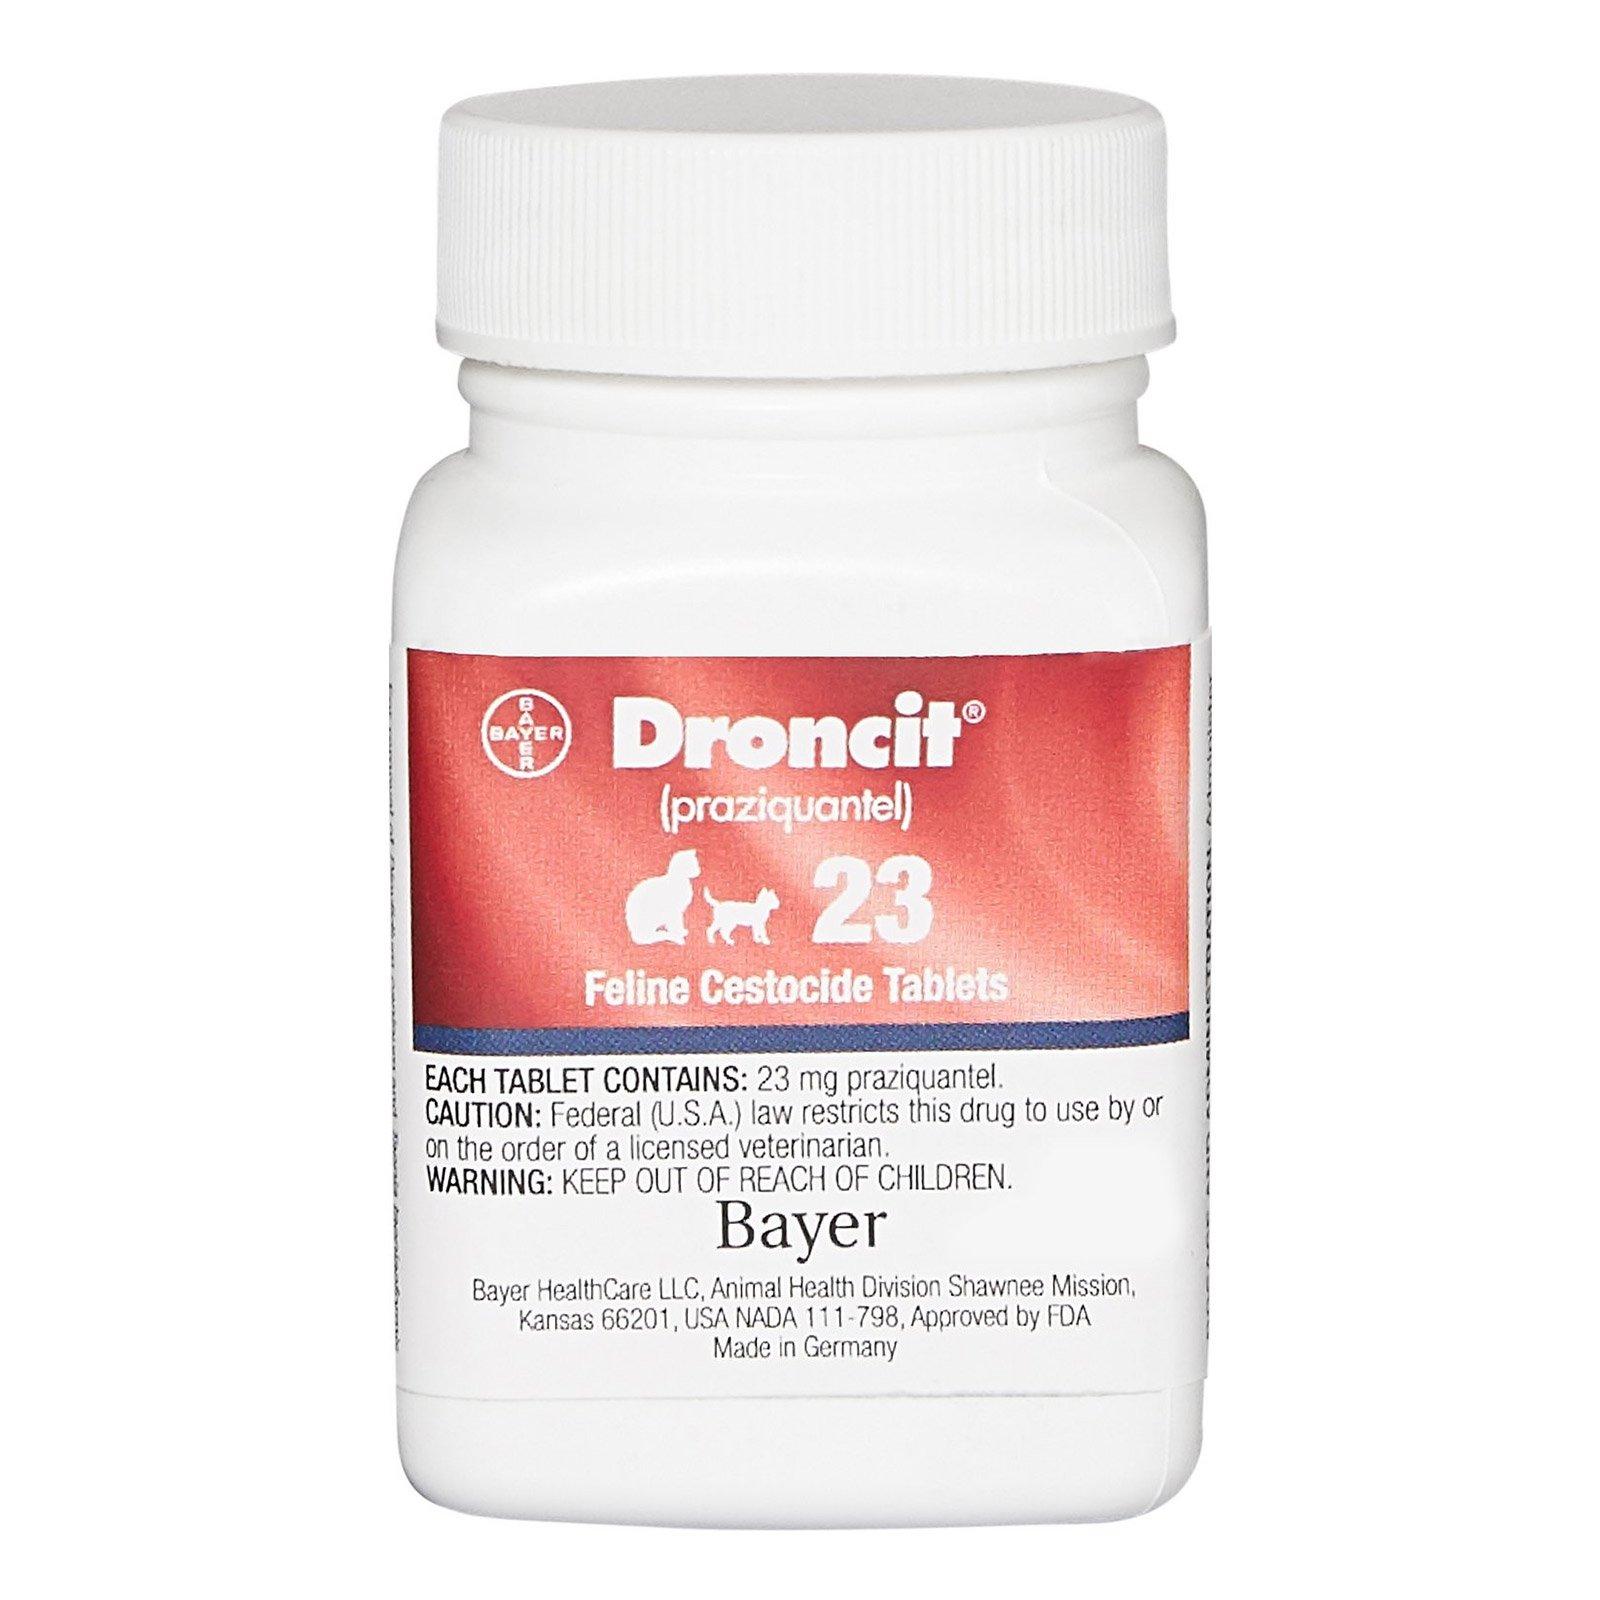 Droncit Tapewormer